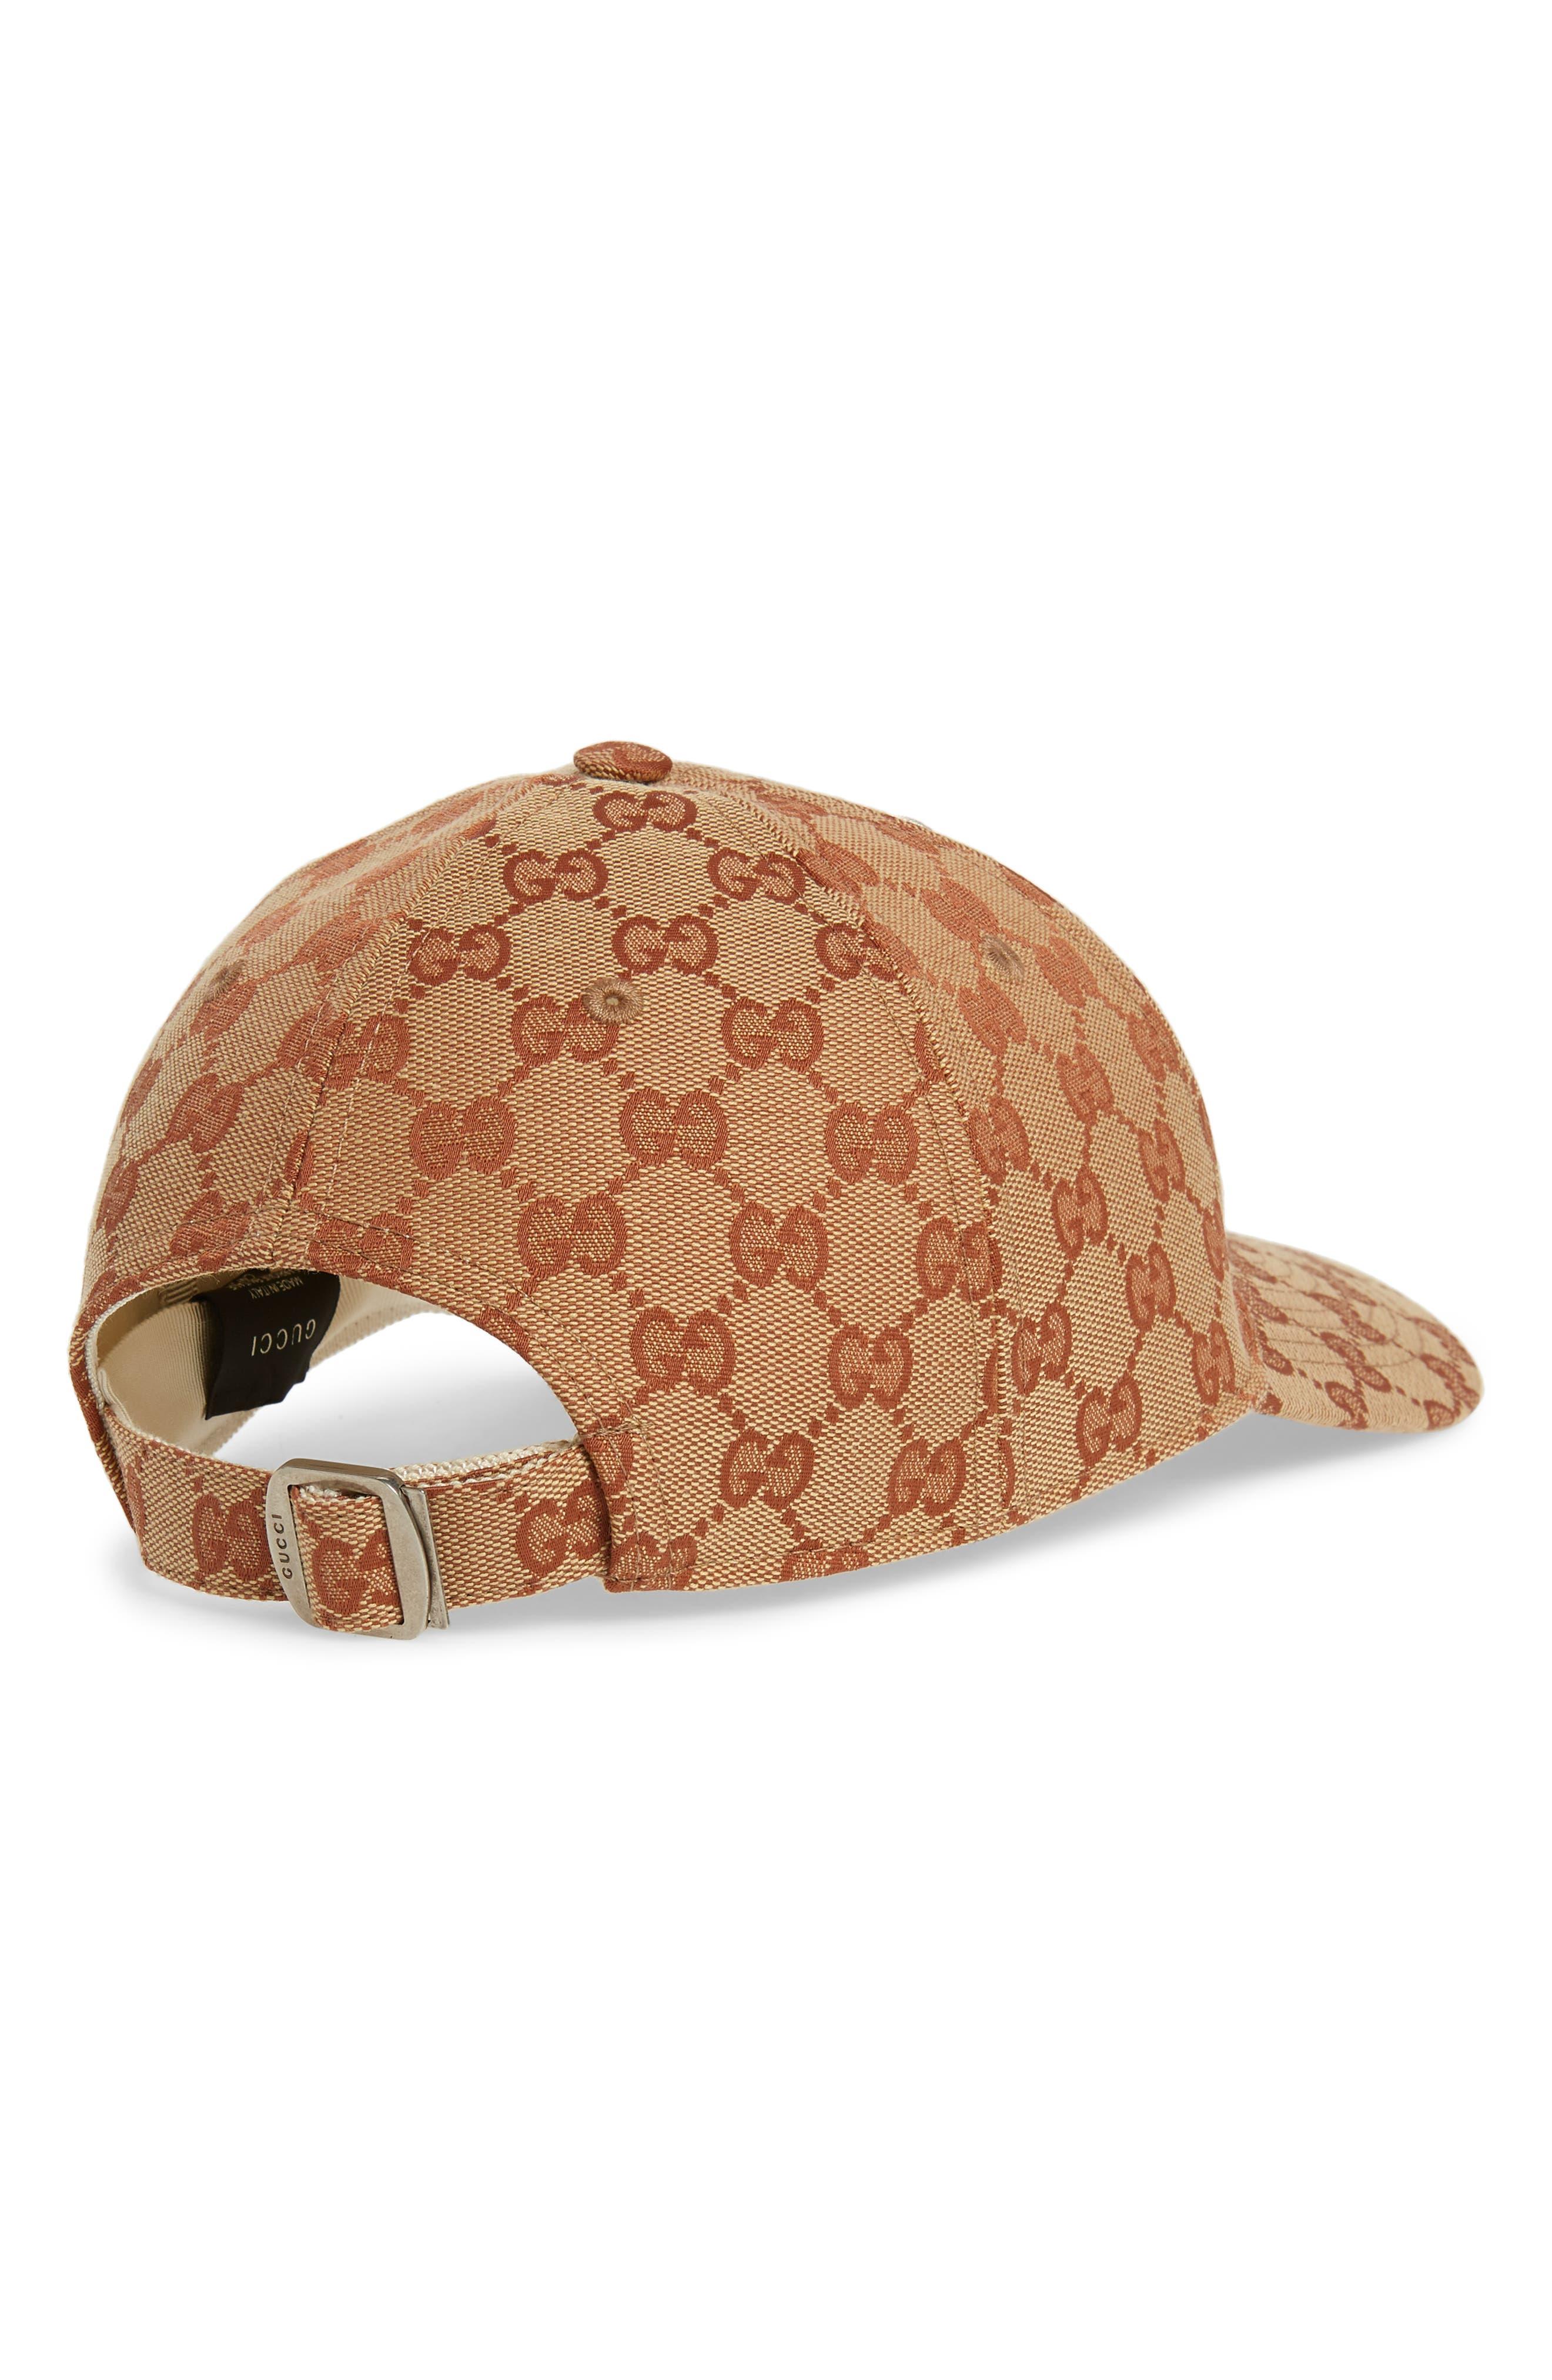 21e9a52e916 Gucci Hats for Women